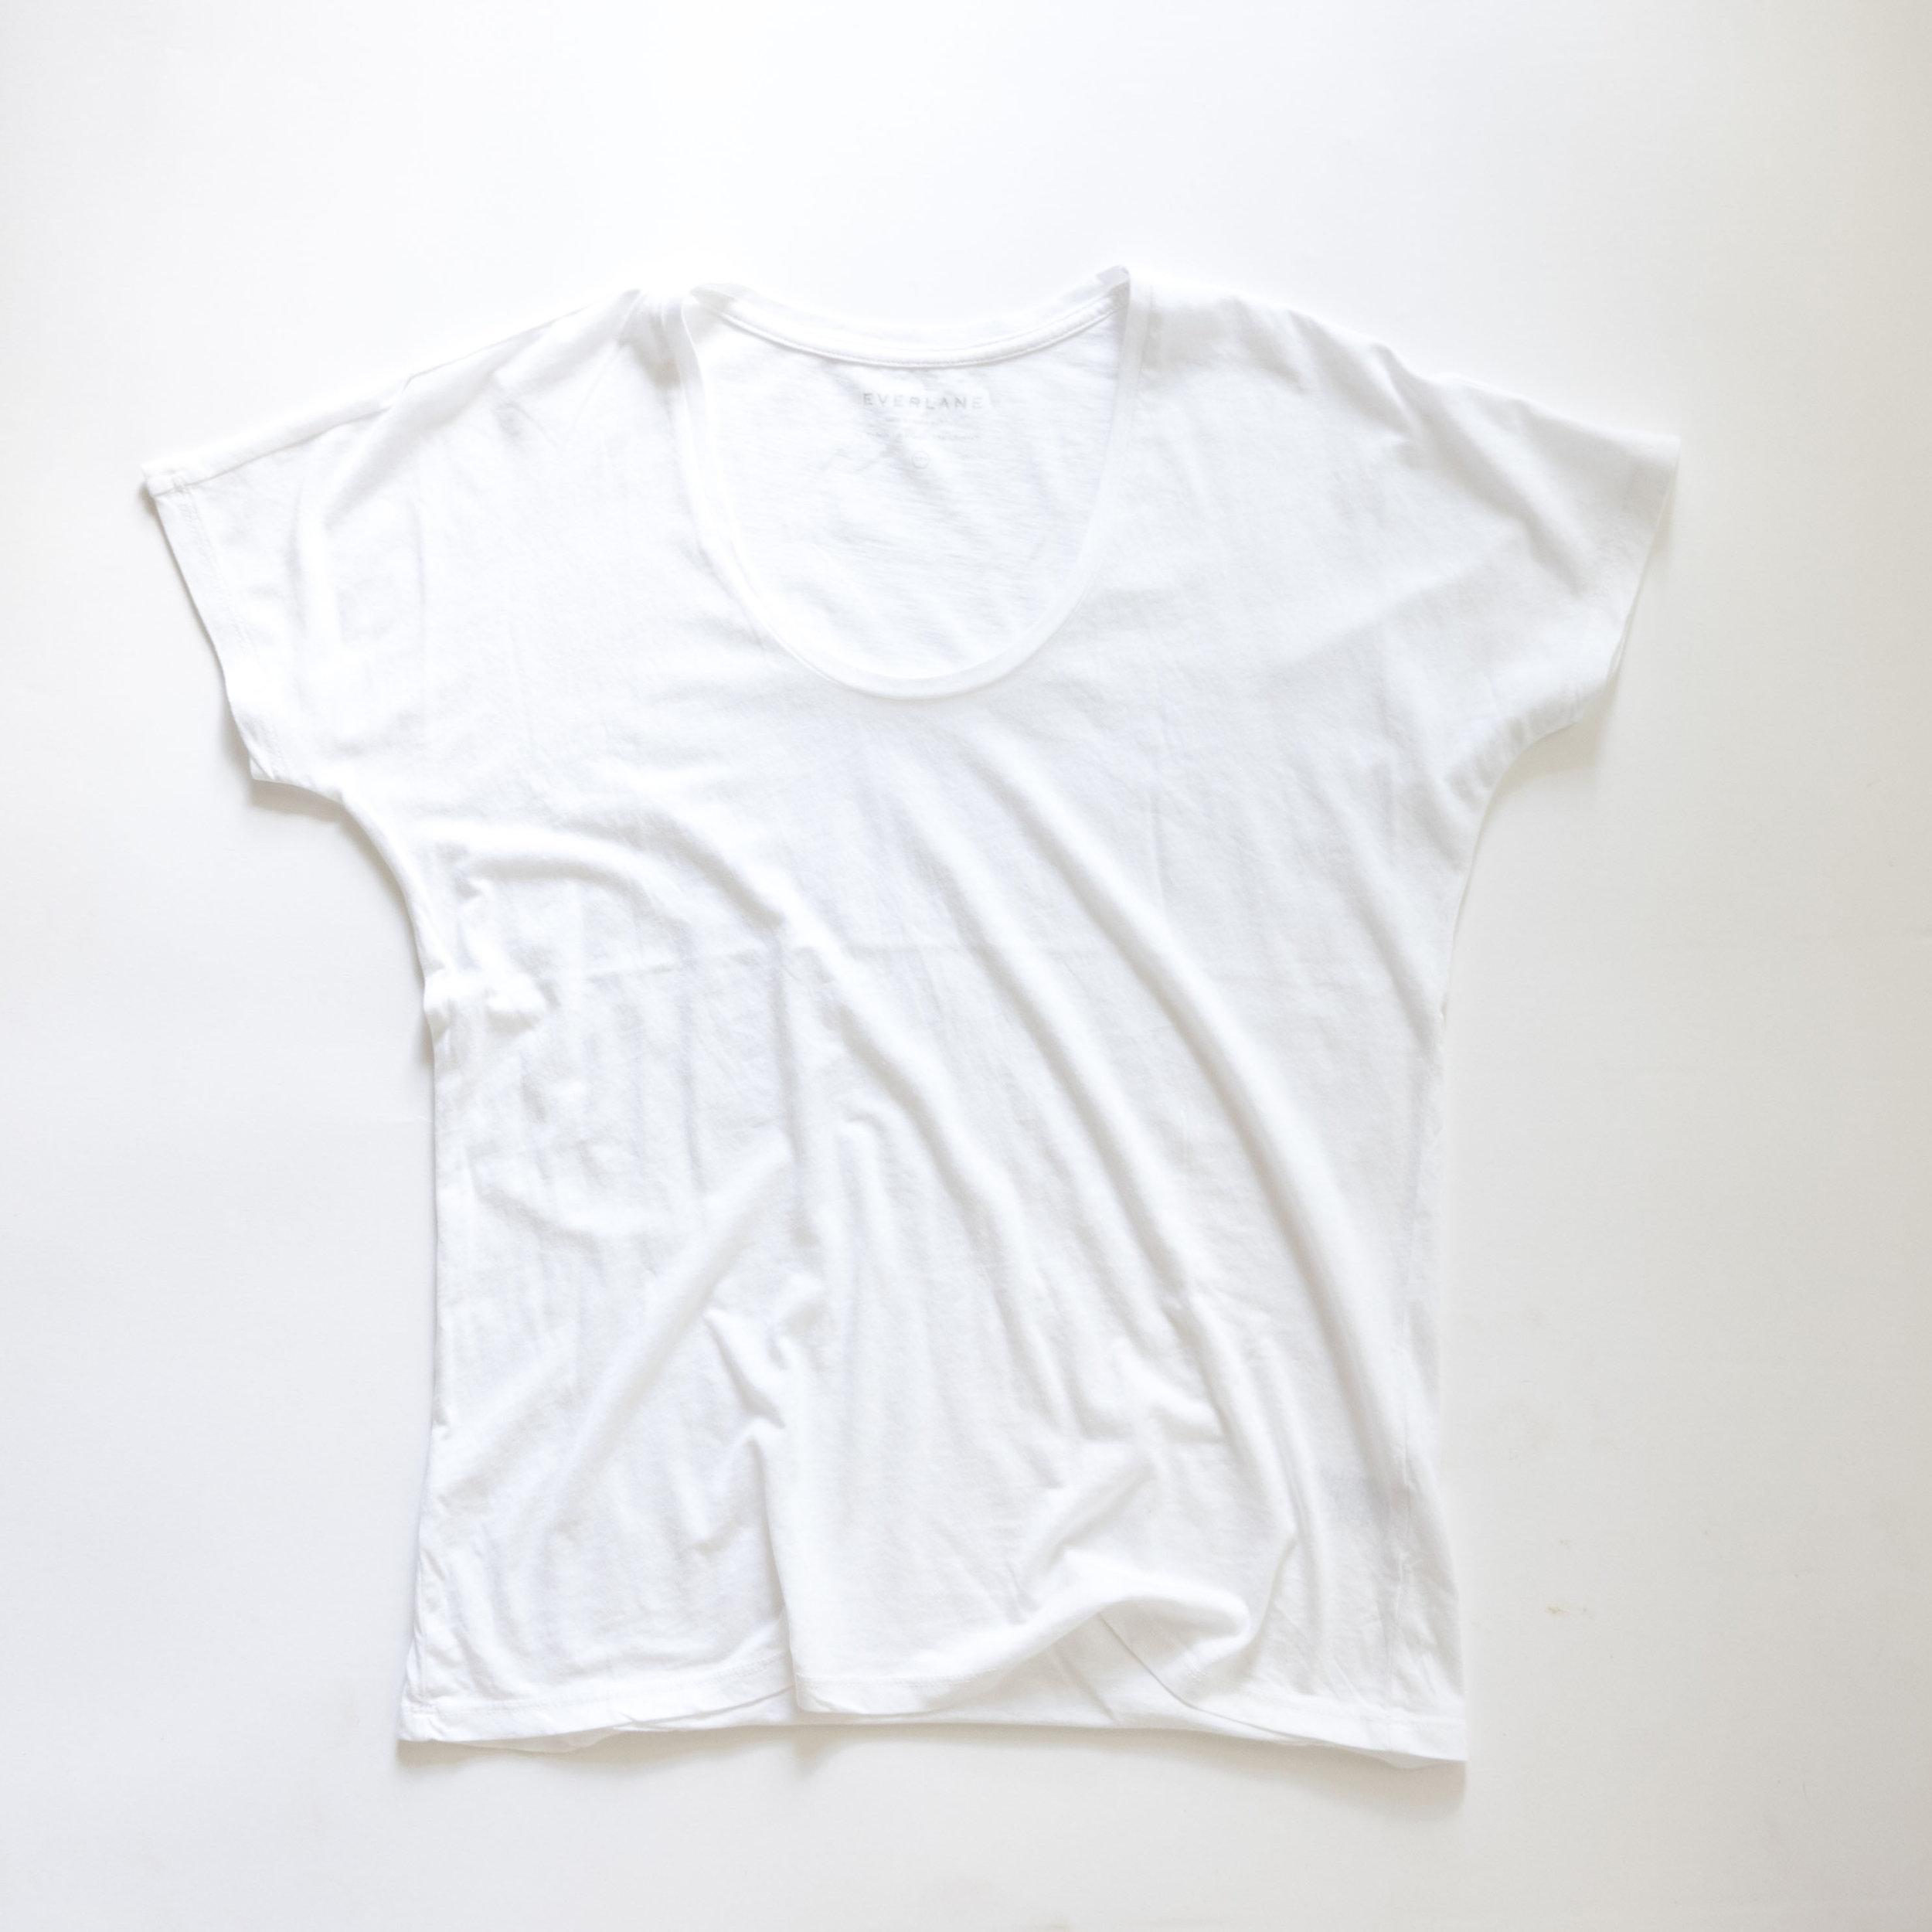 everlane-white-tee.jpg